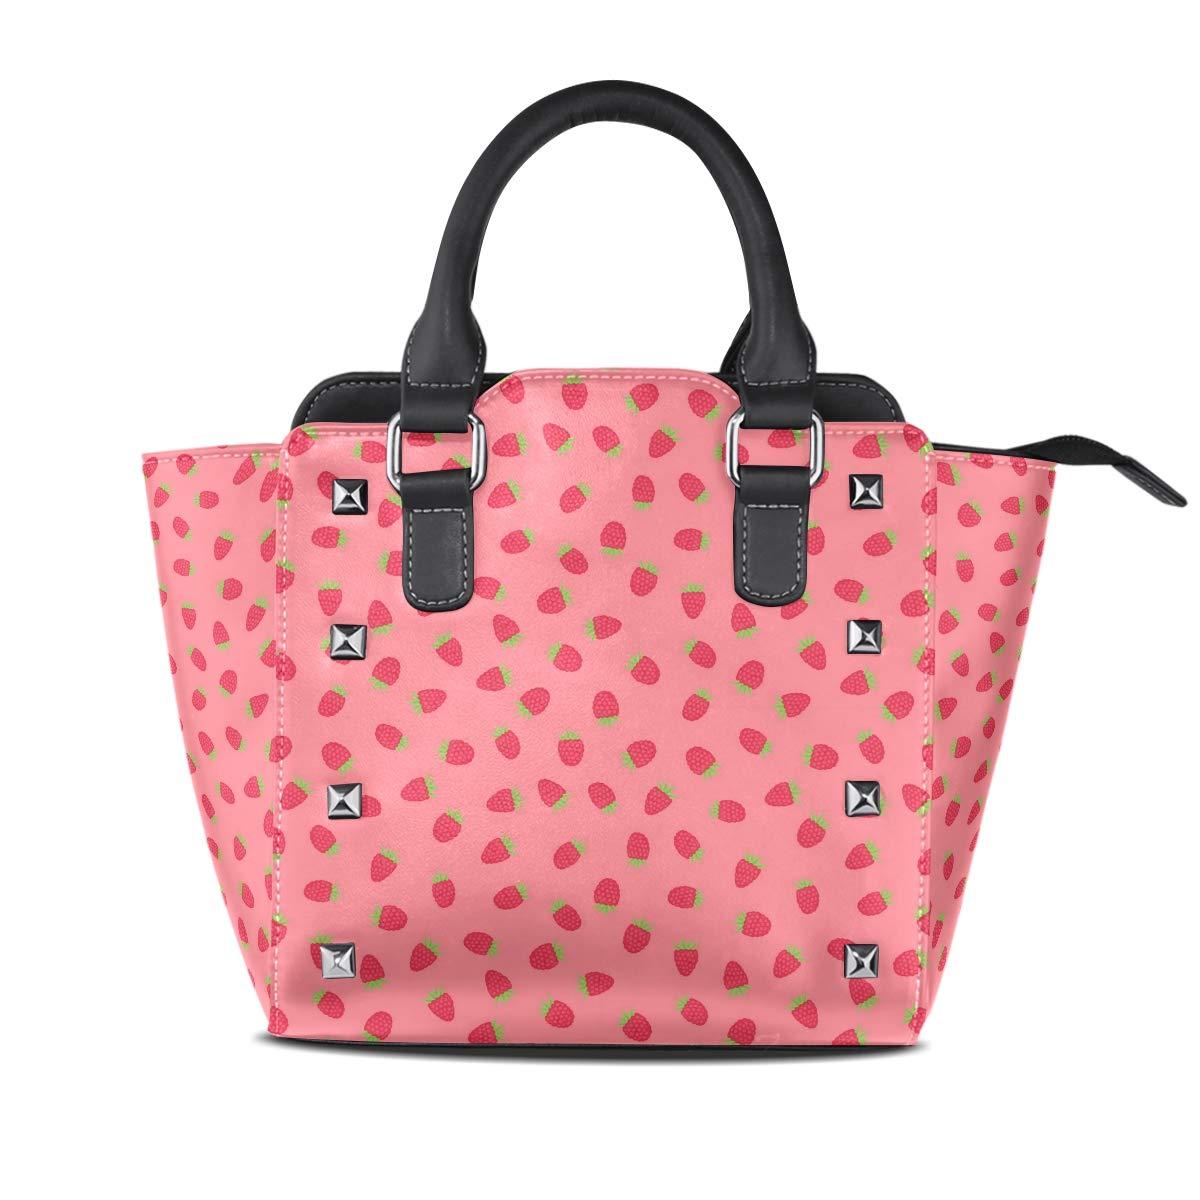 Design2 Handbag Watermelon Seed Genuine Leather Tote Rivet Bag Shoulder Strap Top Handle Women